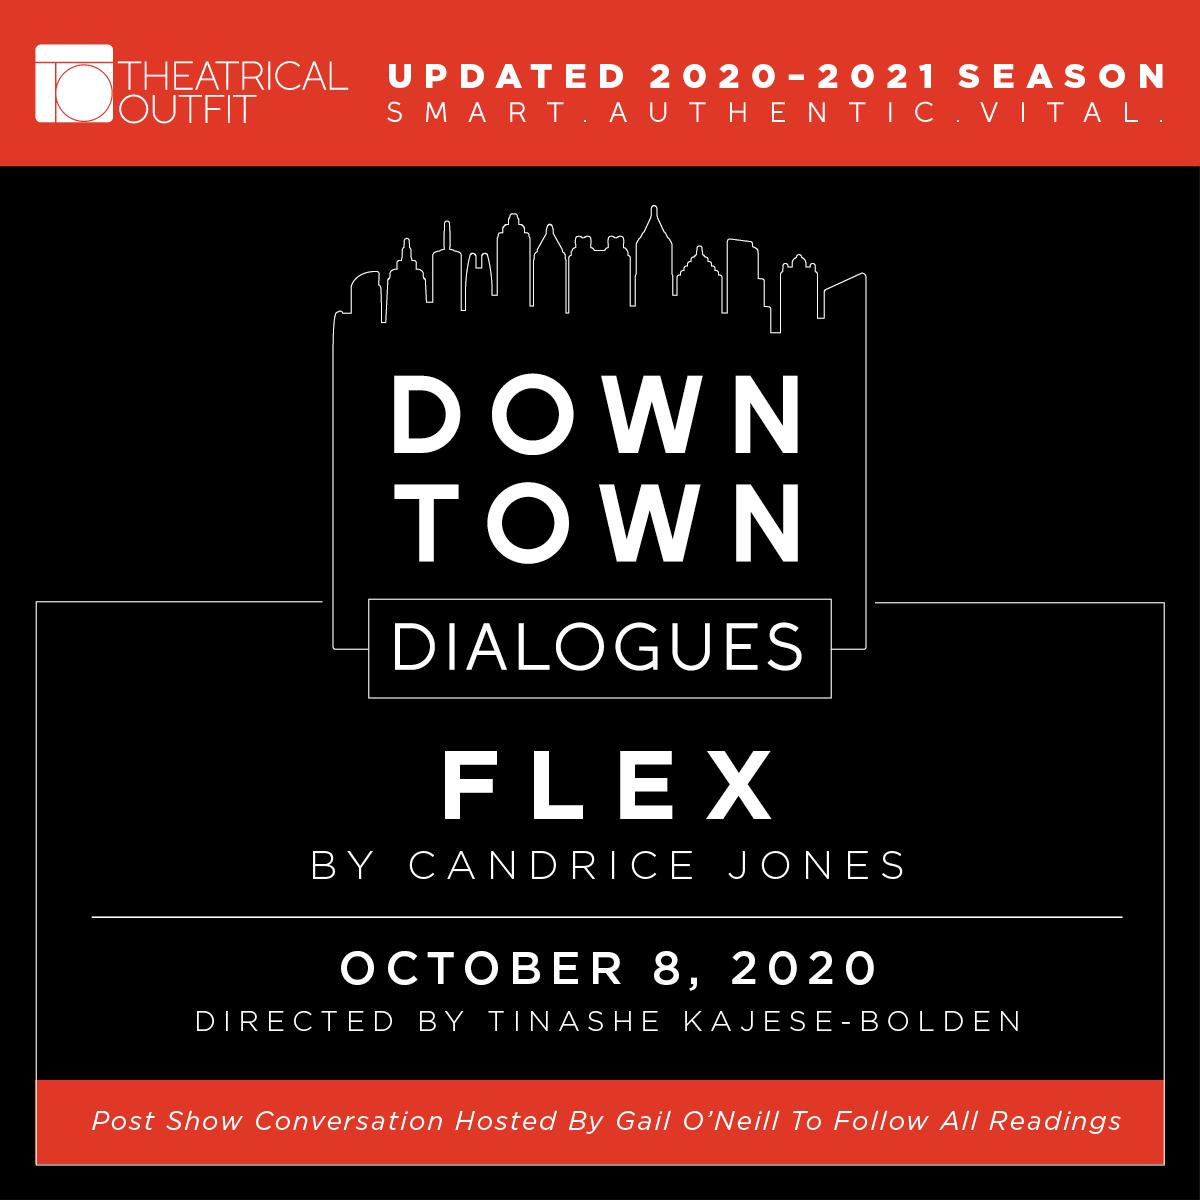 2020-21_TO_Season_SOCIAL_1200x1200_v1_DTD-Flex